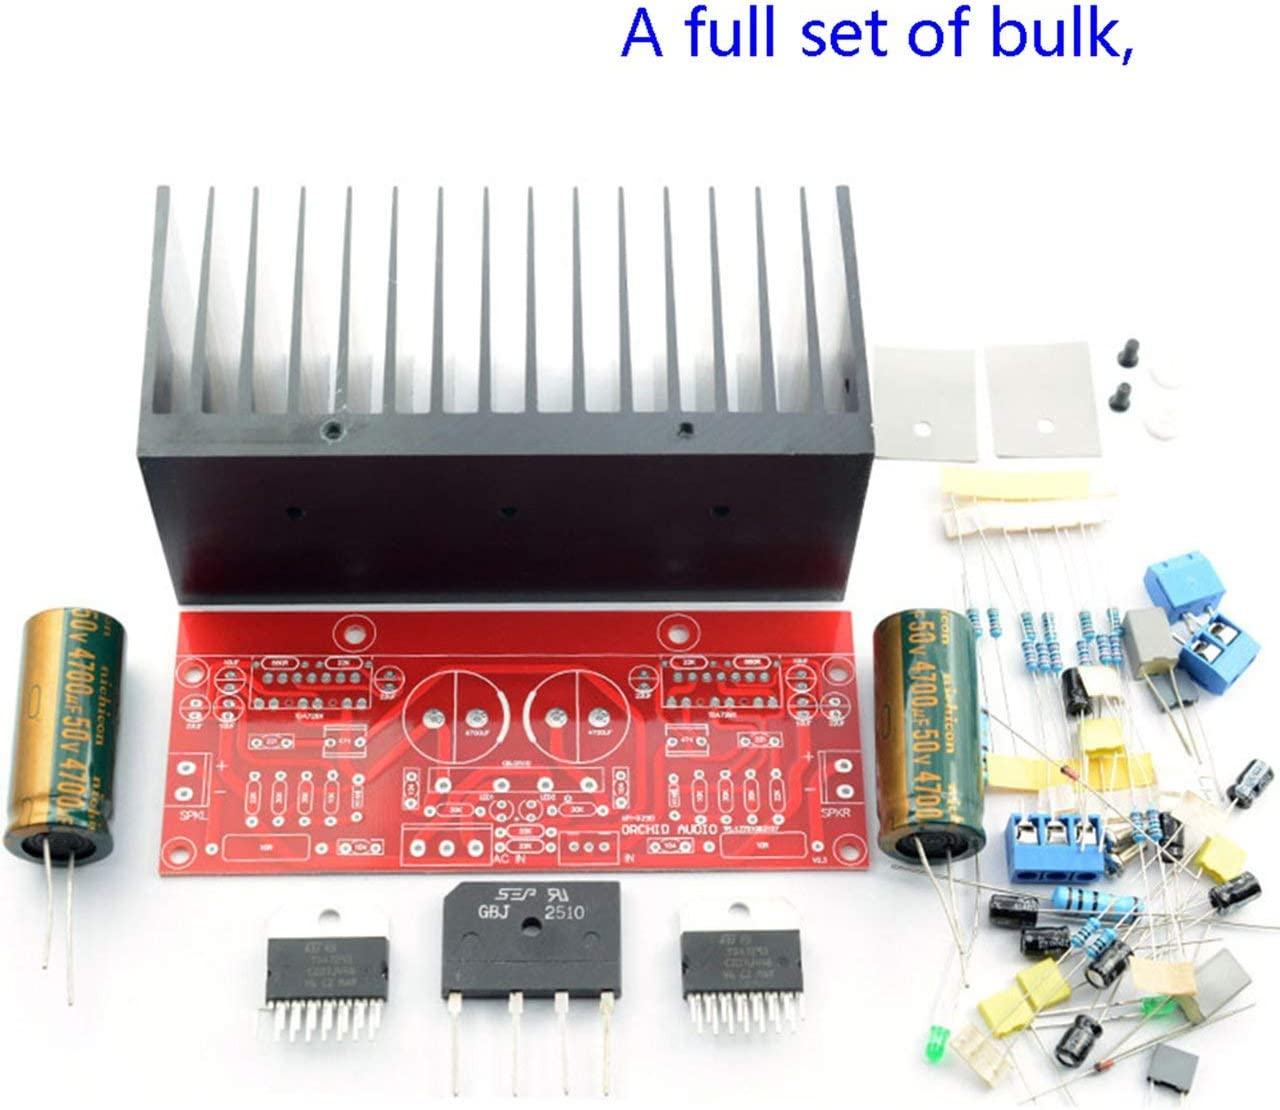 Dual AC12-32V 2.0 Channel 100 + 100W TDA7293 HiFi Stereo Audio Amplifier Module Board DIY Kit Producto Terminado (Rojo) ESjasnyfall